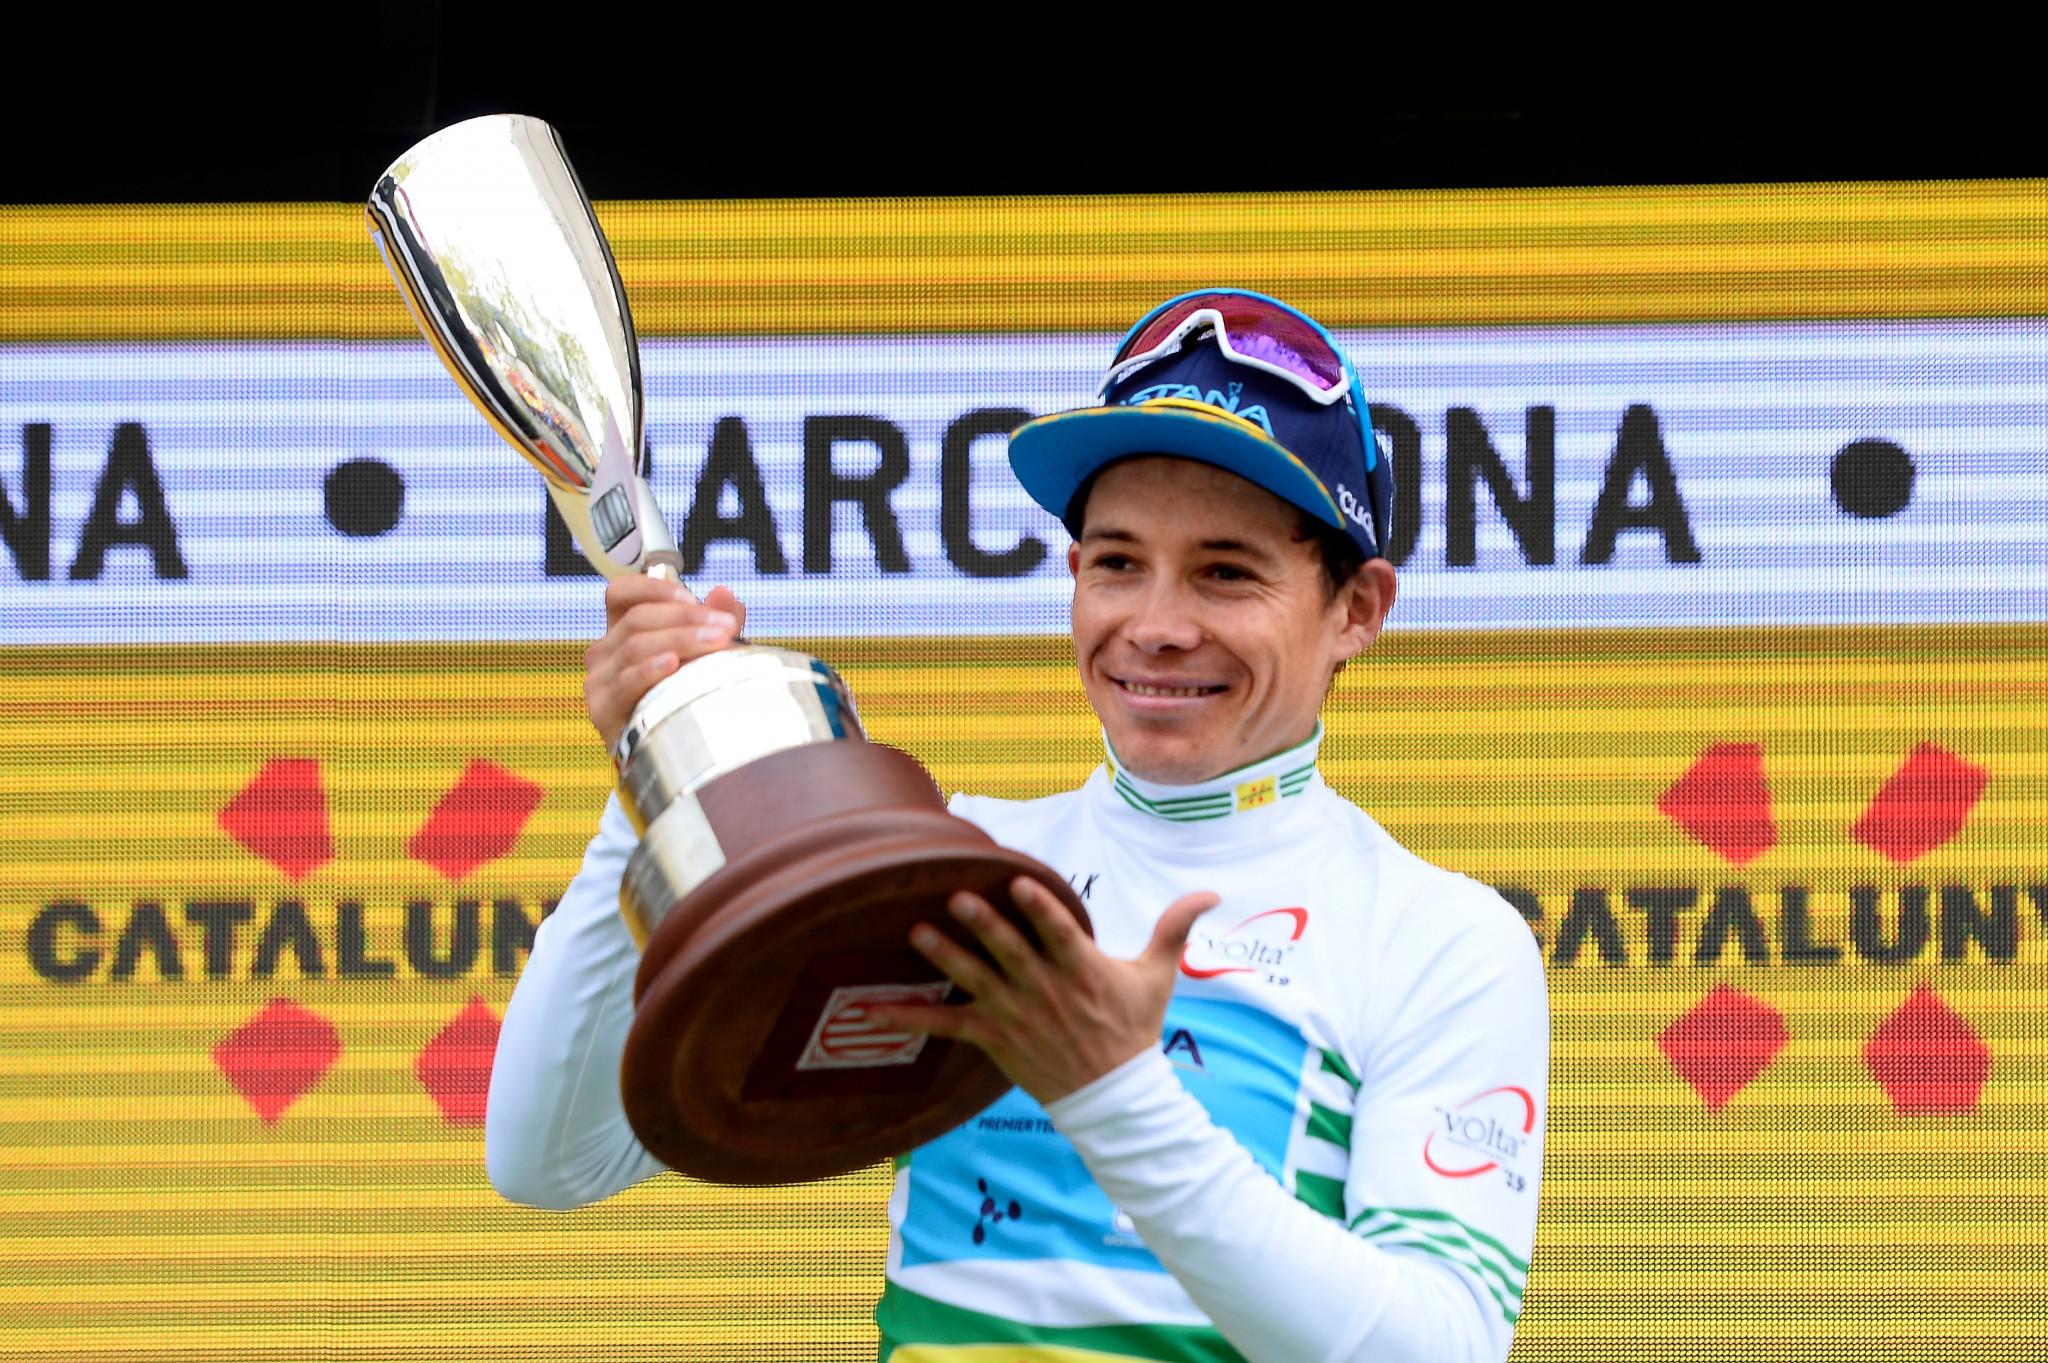 Lopez survives scare to claim Volta a Catalunya title